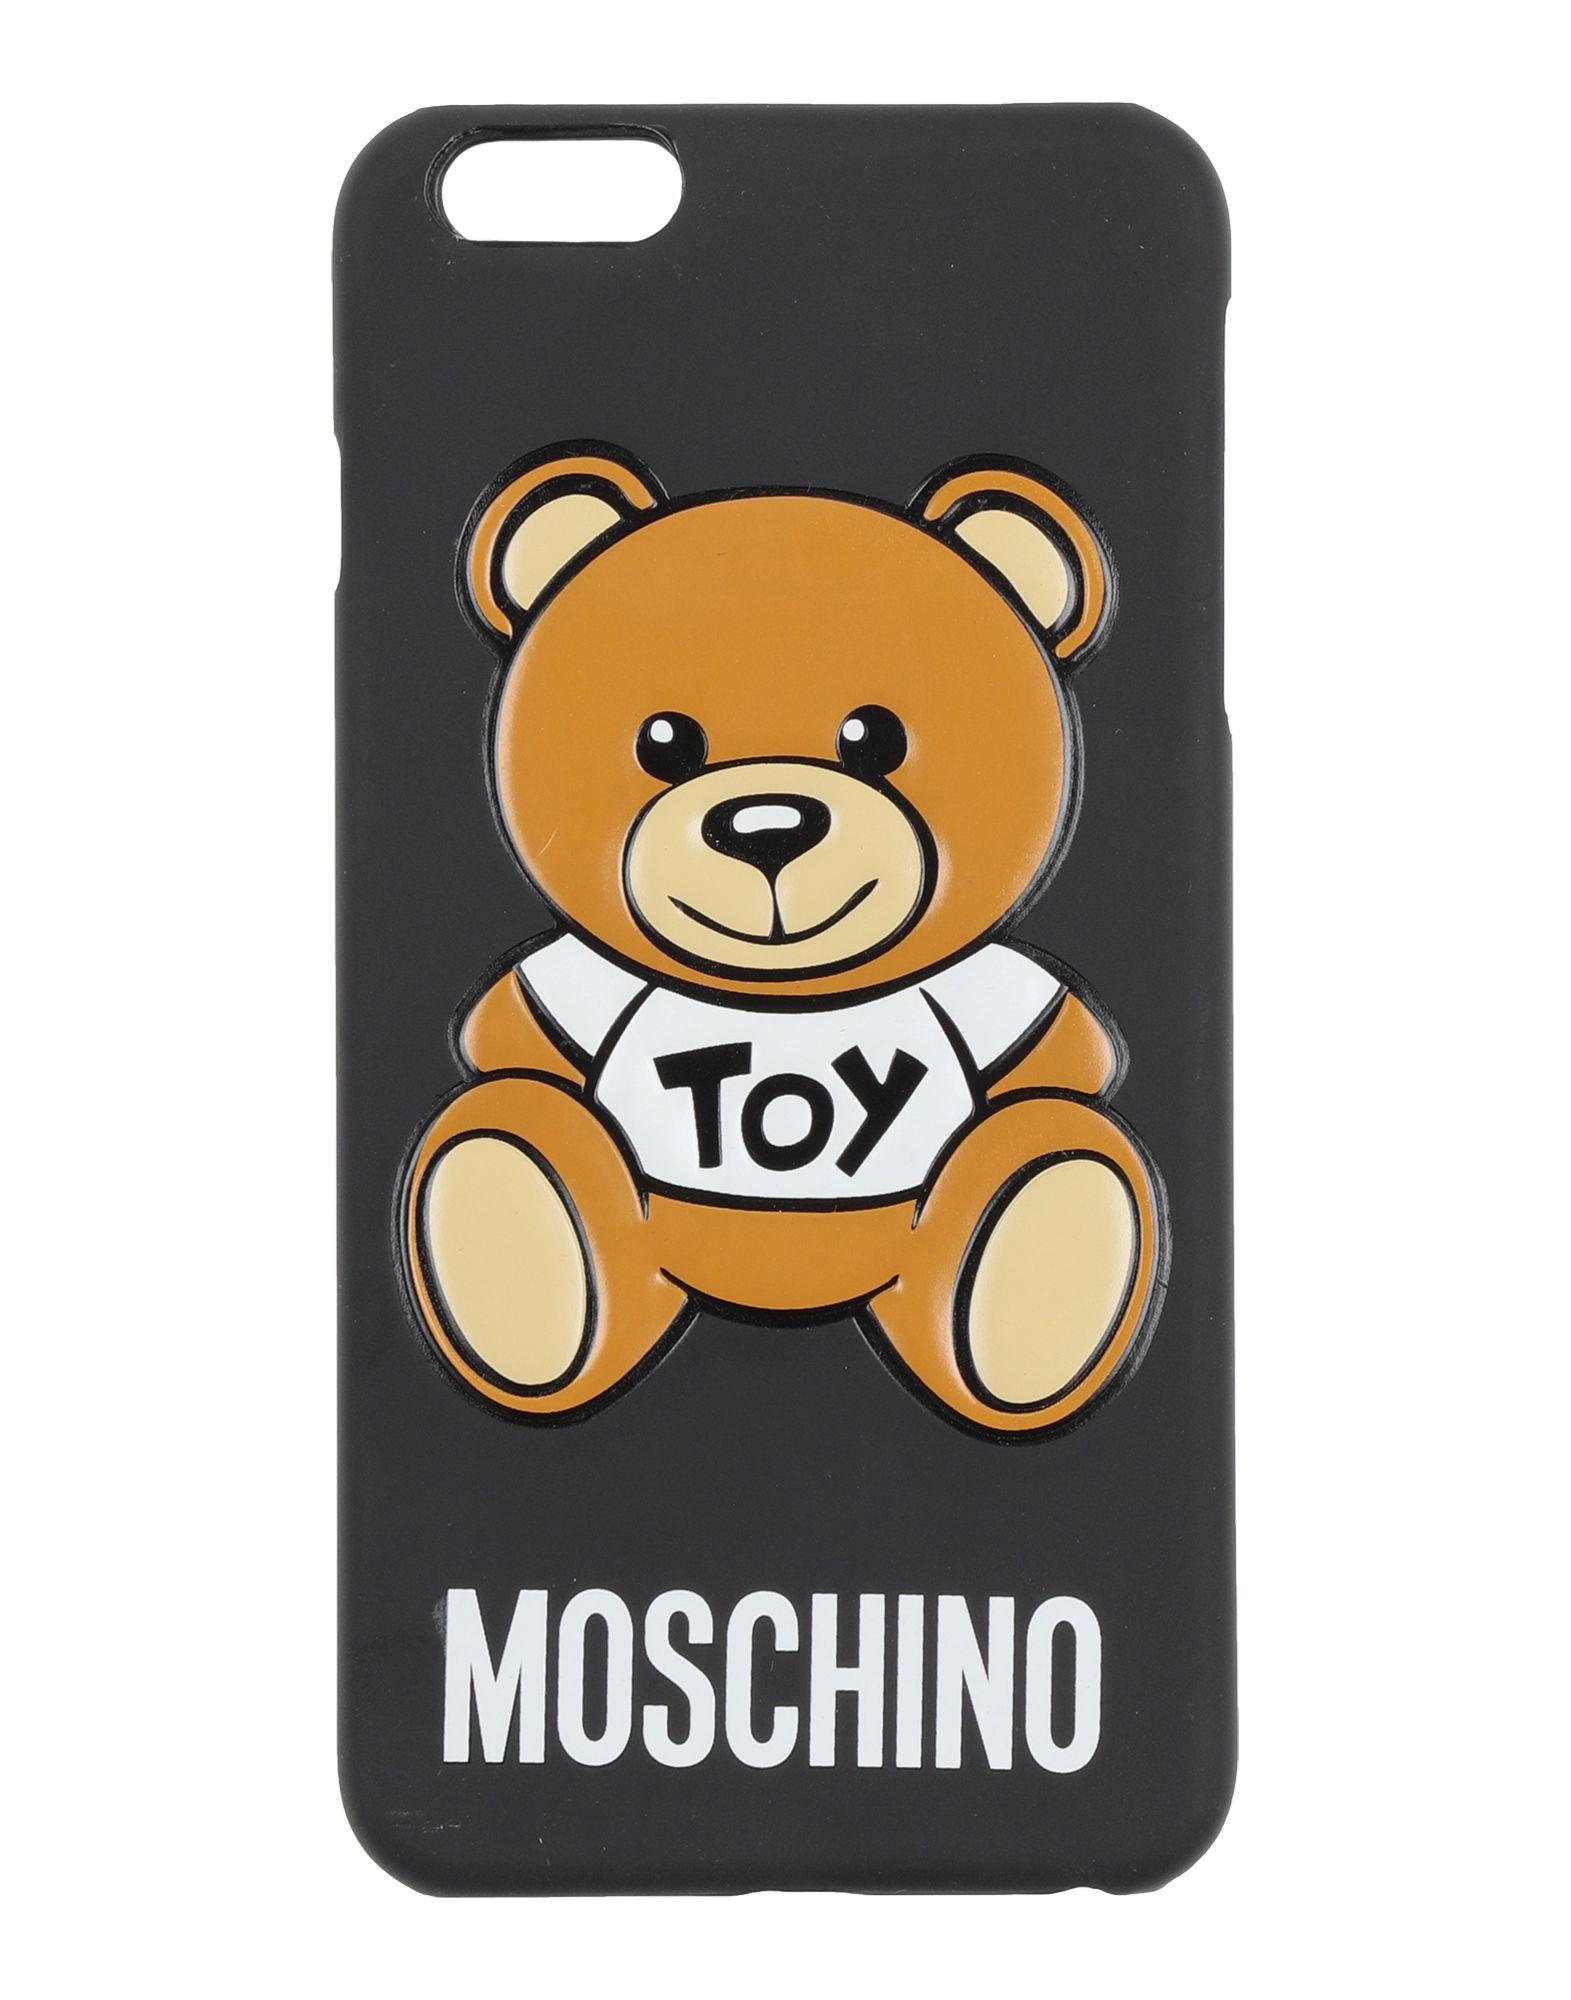 Фото - MOSCHINO Чехол чехол накладка для apple iphone 6 6s deppa gel plus case 85213 pink клип кейс полиуретан